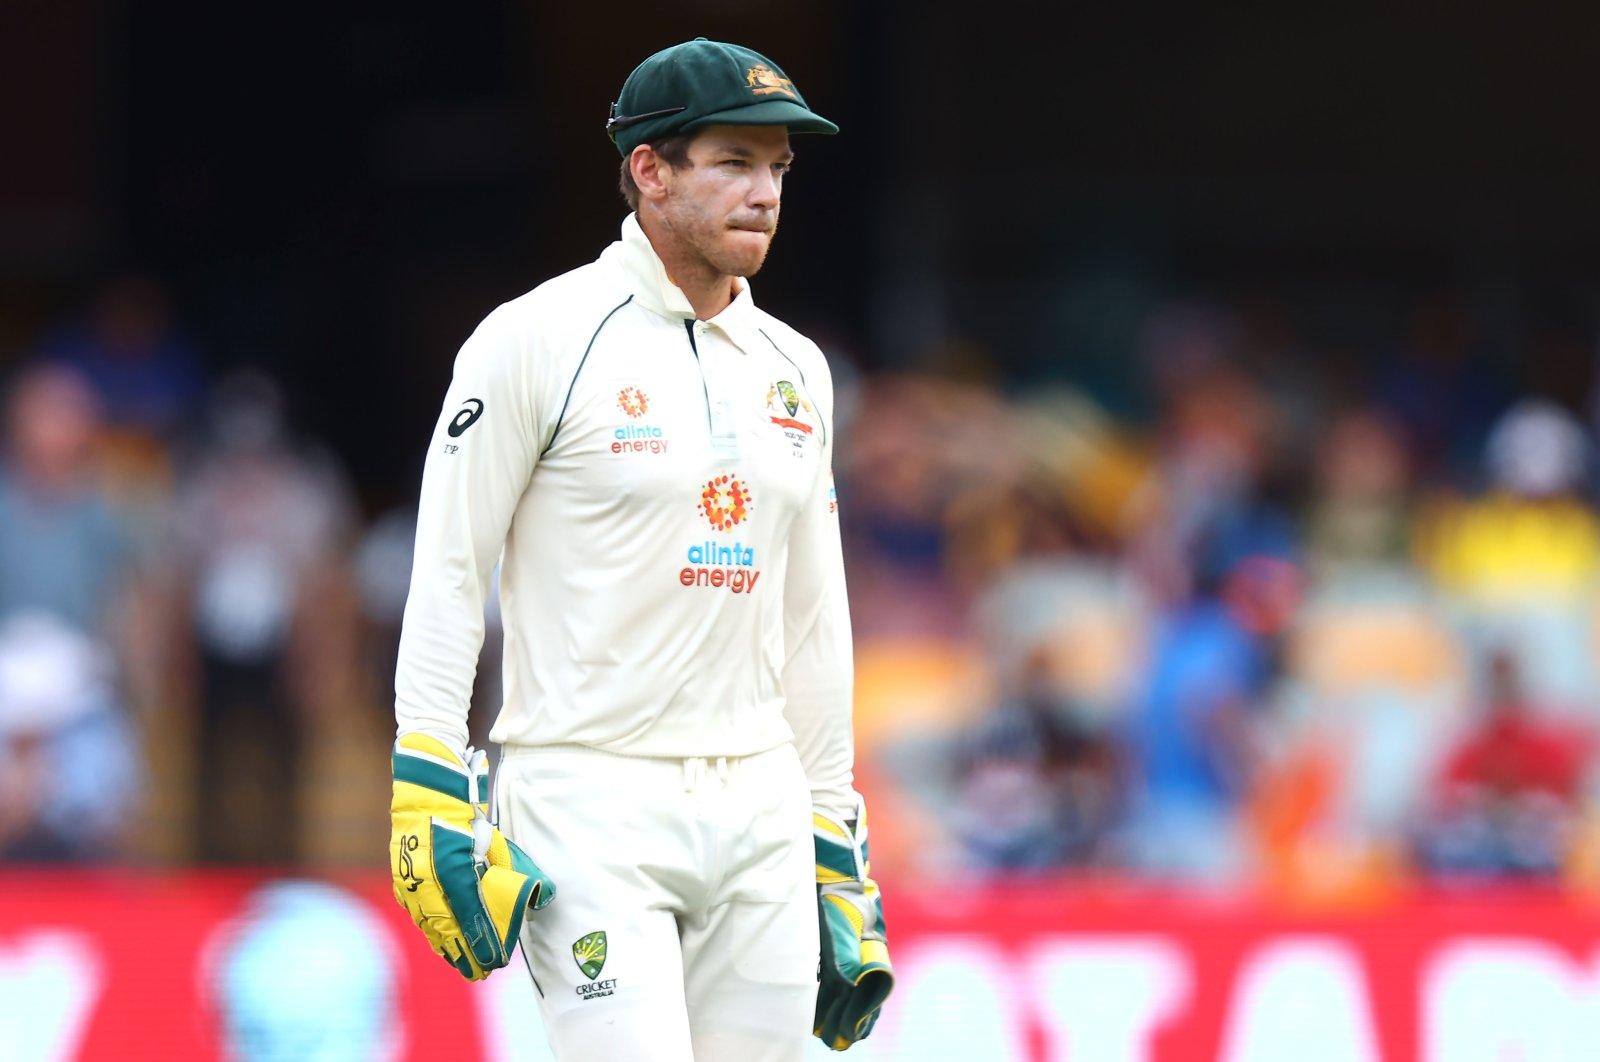 Australian captain Tim Paine looks on during a Test match against India at The Gabba, Brisbane, Australia, Jan. 19, 2021. (AFP Photo)